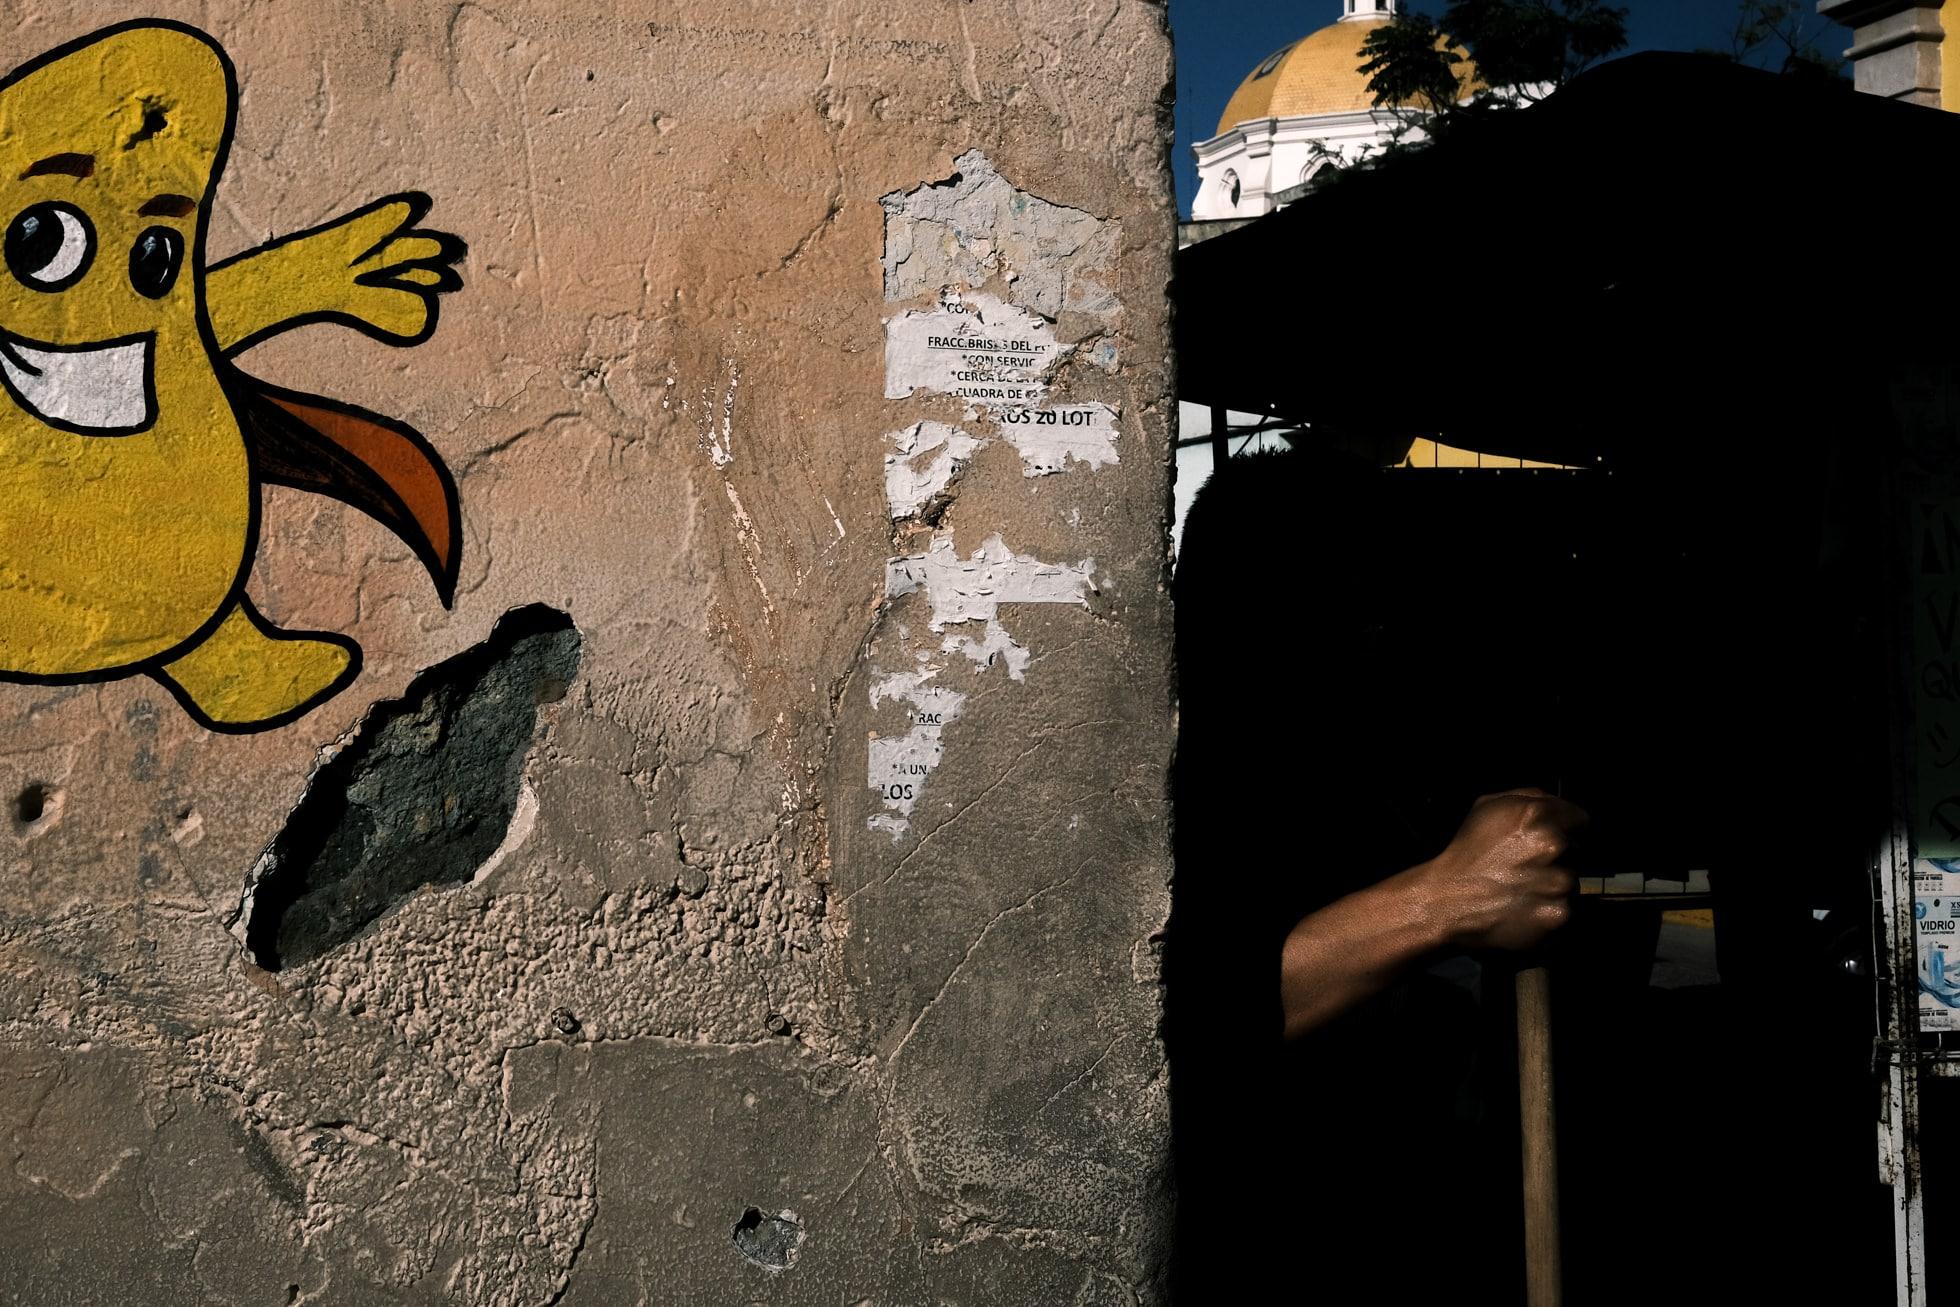 fujifilm-x-pro3-mexico-street-photography-74